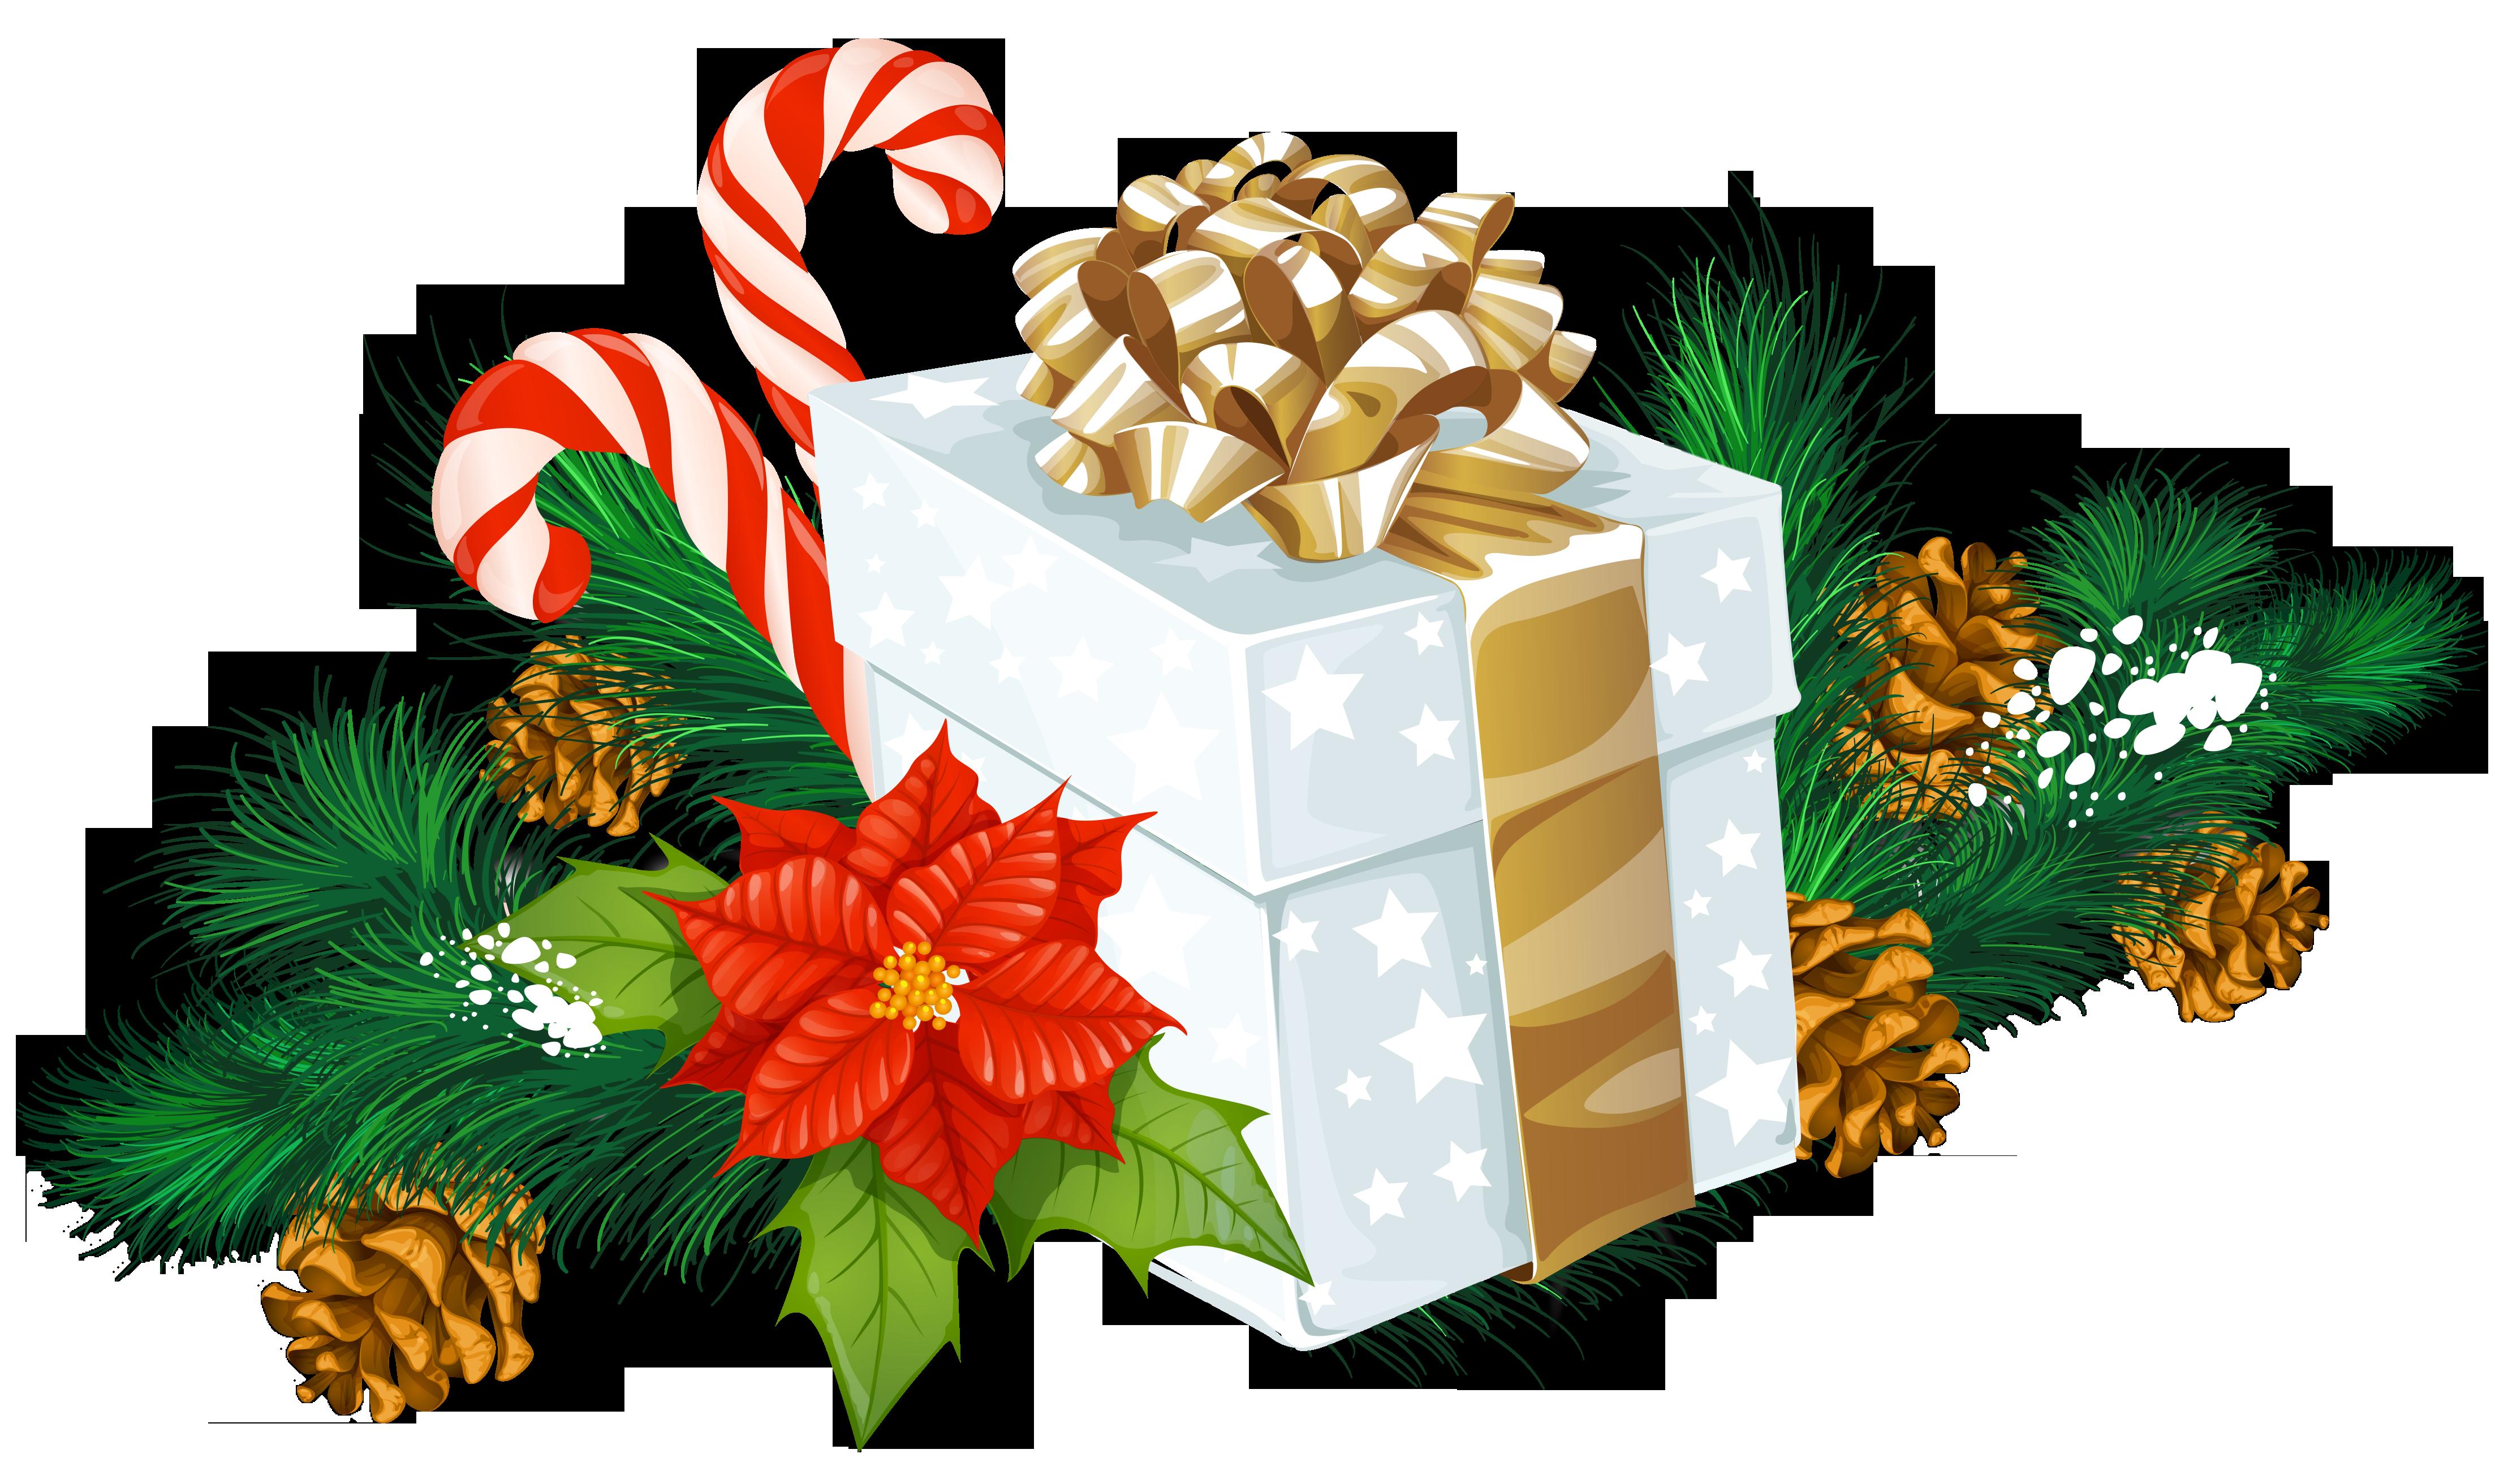 Christmas party transparent cliparts clip freeuse stock Christmas Holiday Party Clip art - Transparent Christmas White Gift ... clip freeuse stock